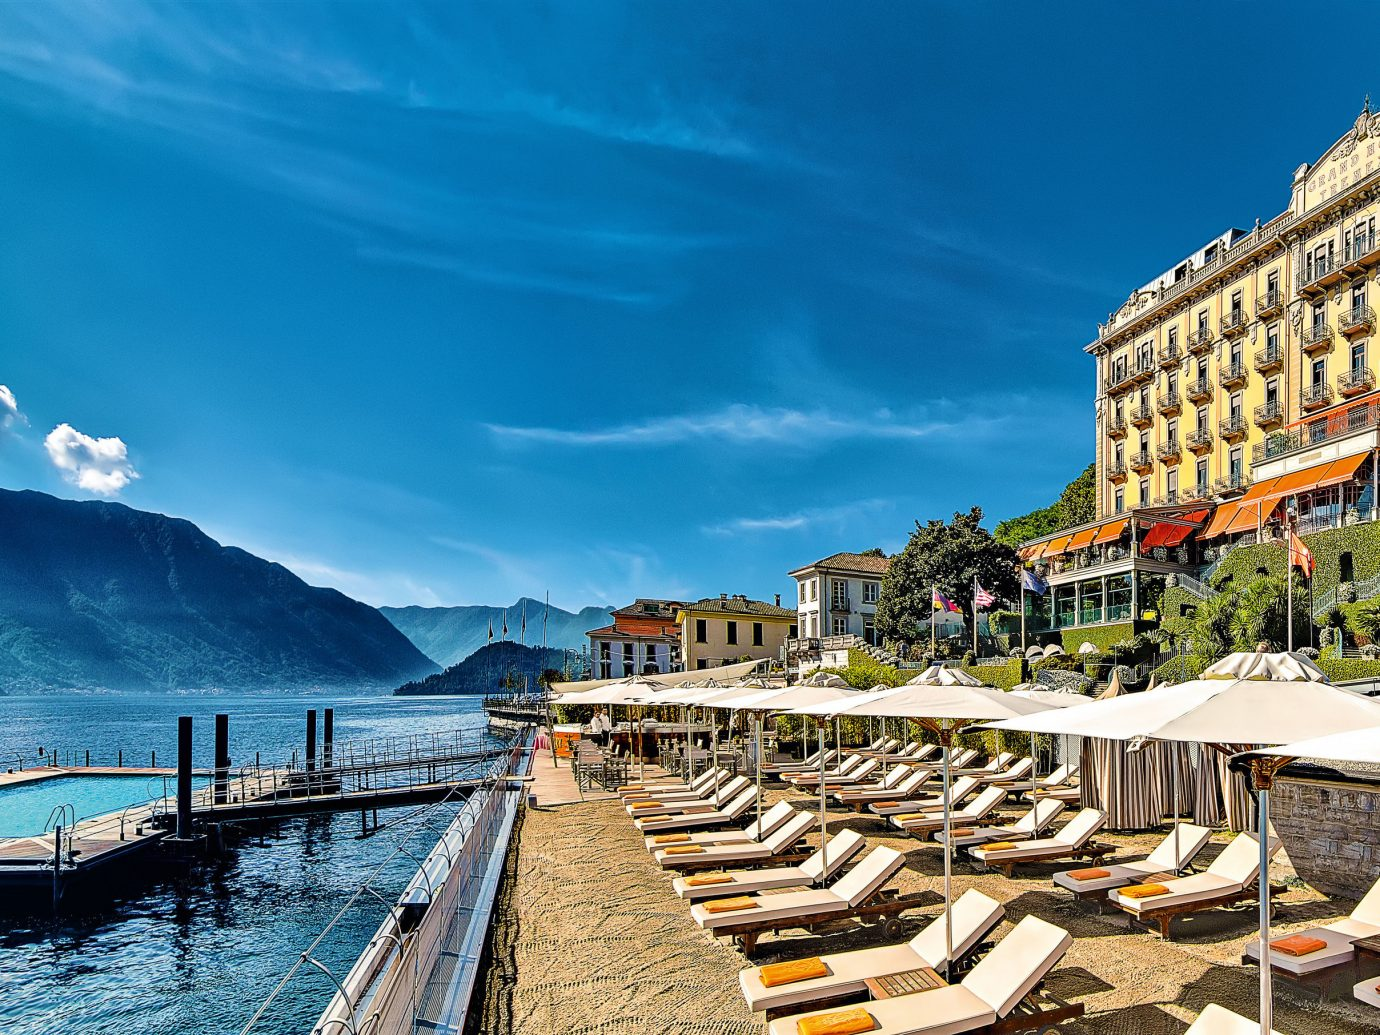 Trip Ideas outdoor sky Town landmark vacation Sea scene tourism cityscape Coast travel